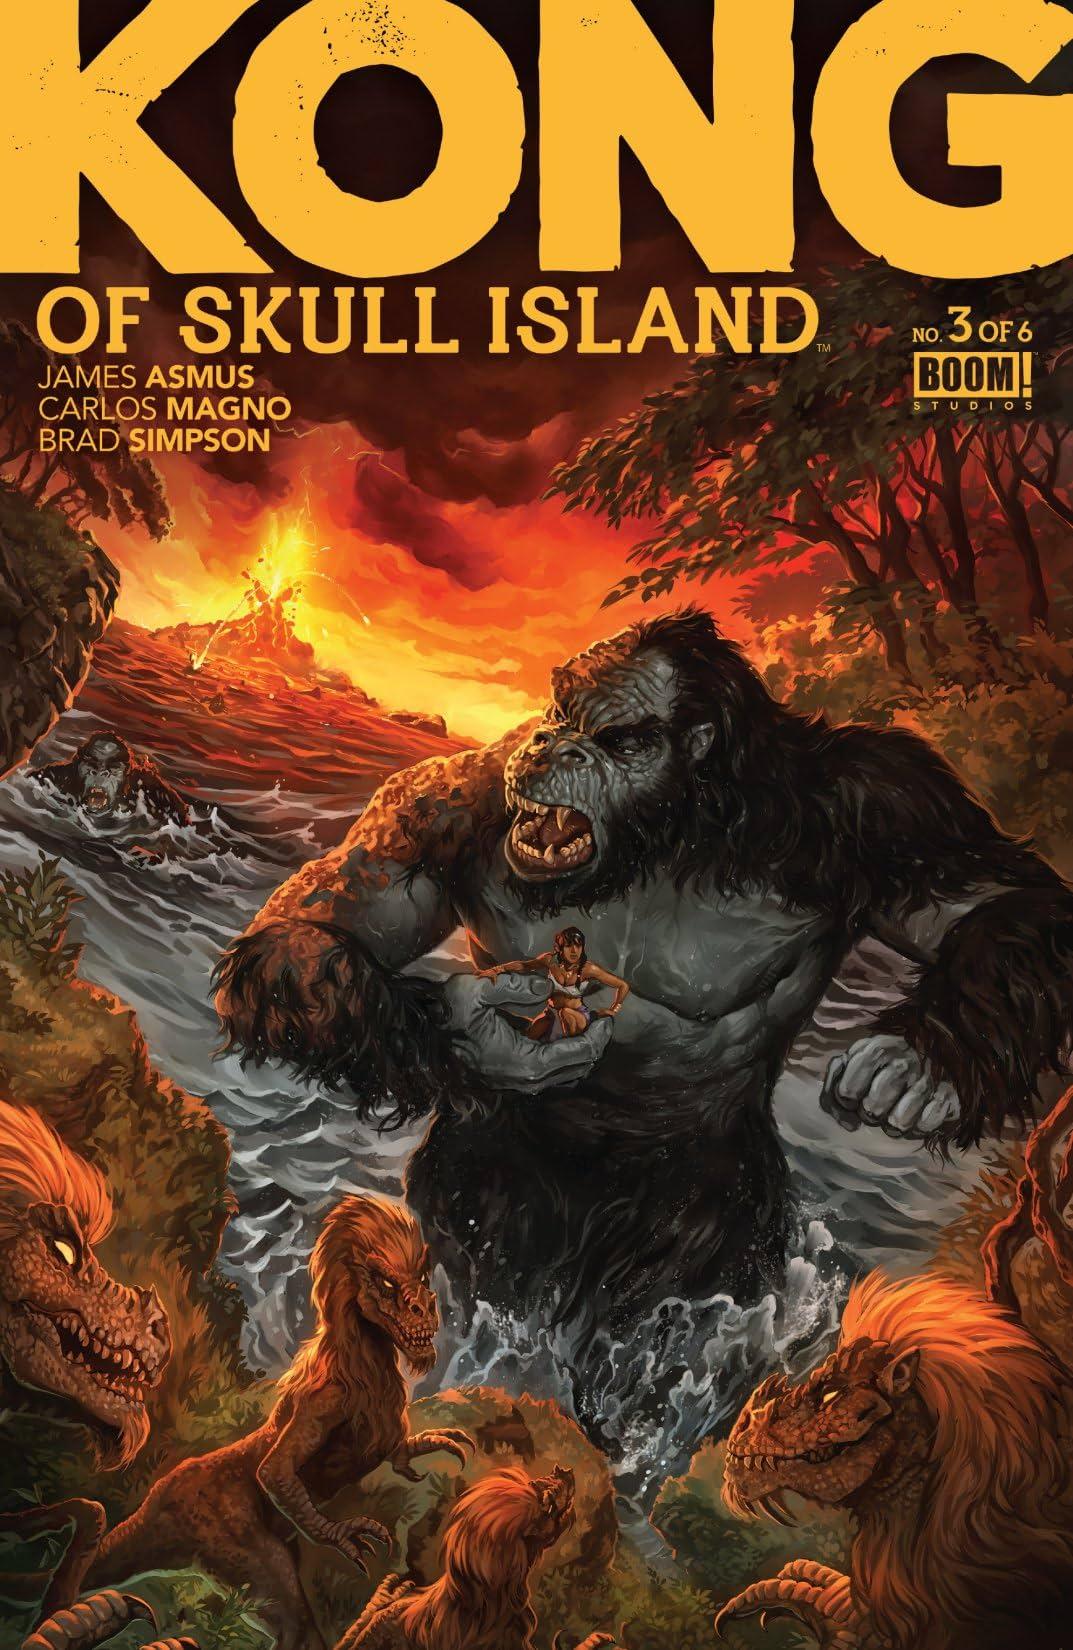 Kong of Skull Island #3